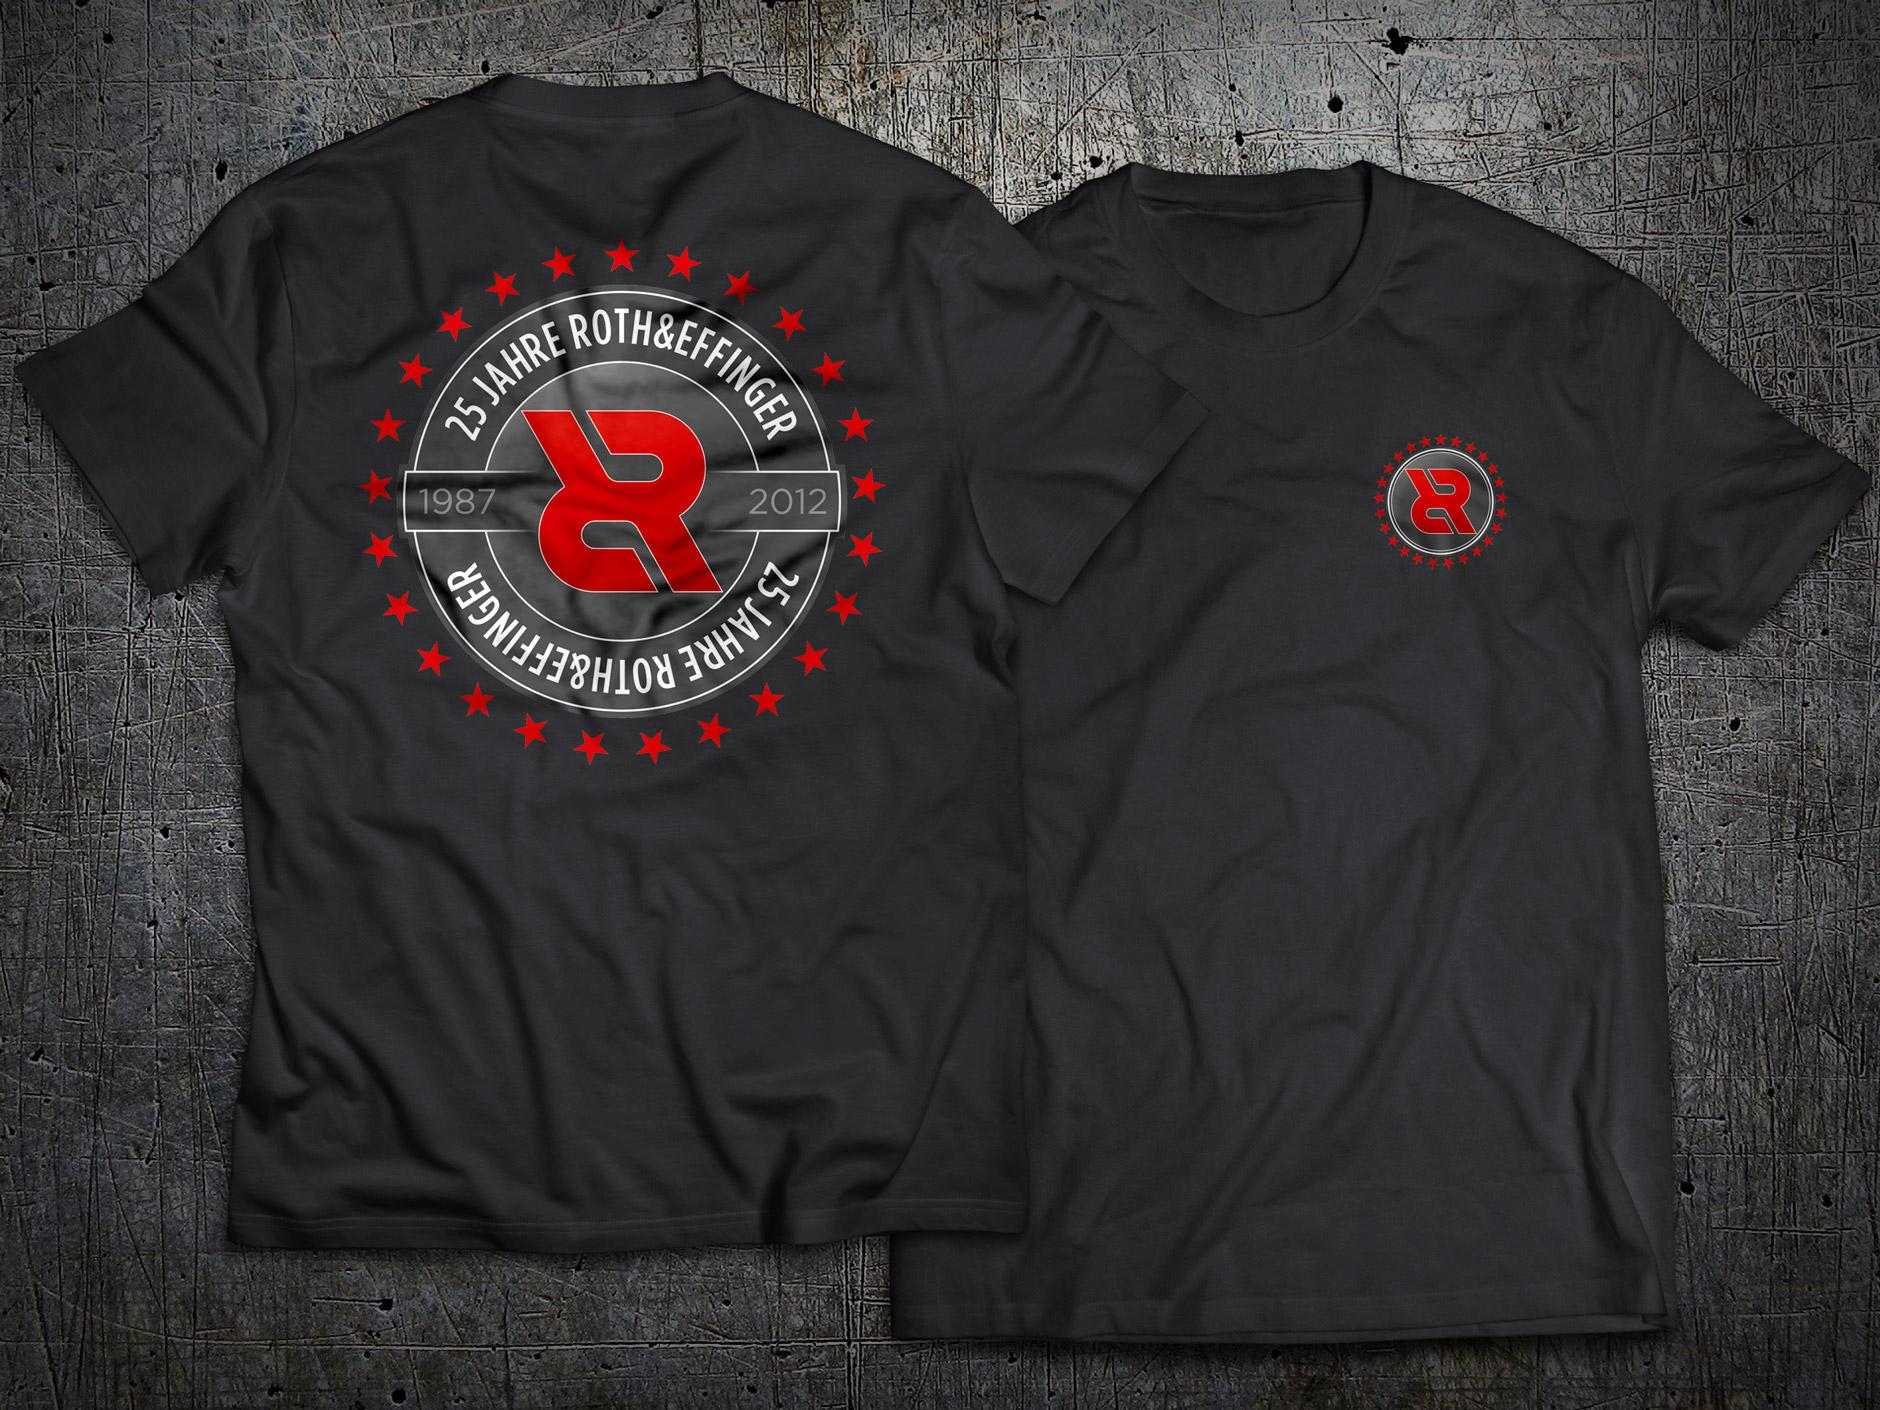 T-Shirt Design ROTH&EFFINGER 25Jahre